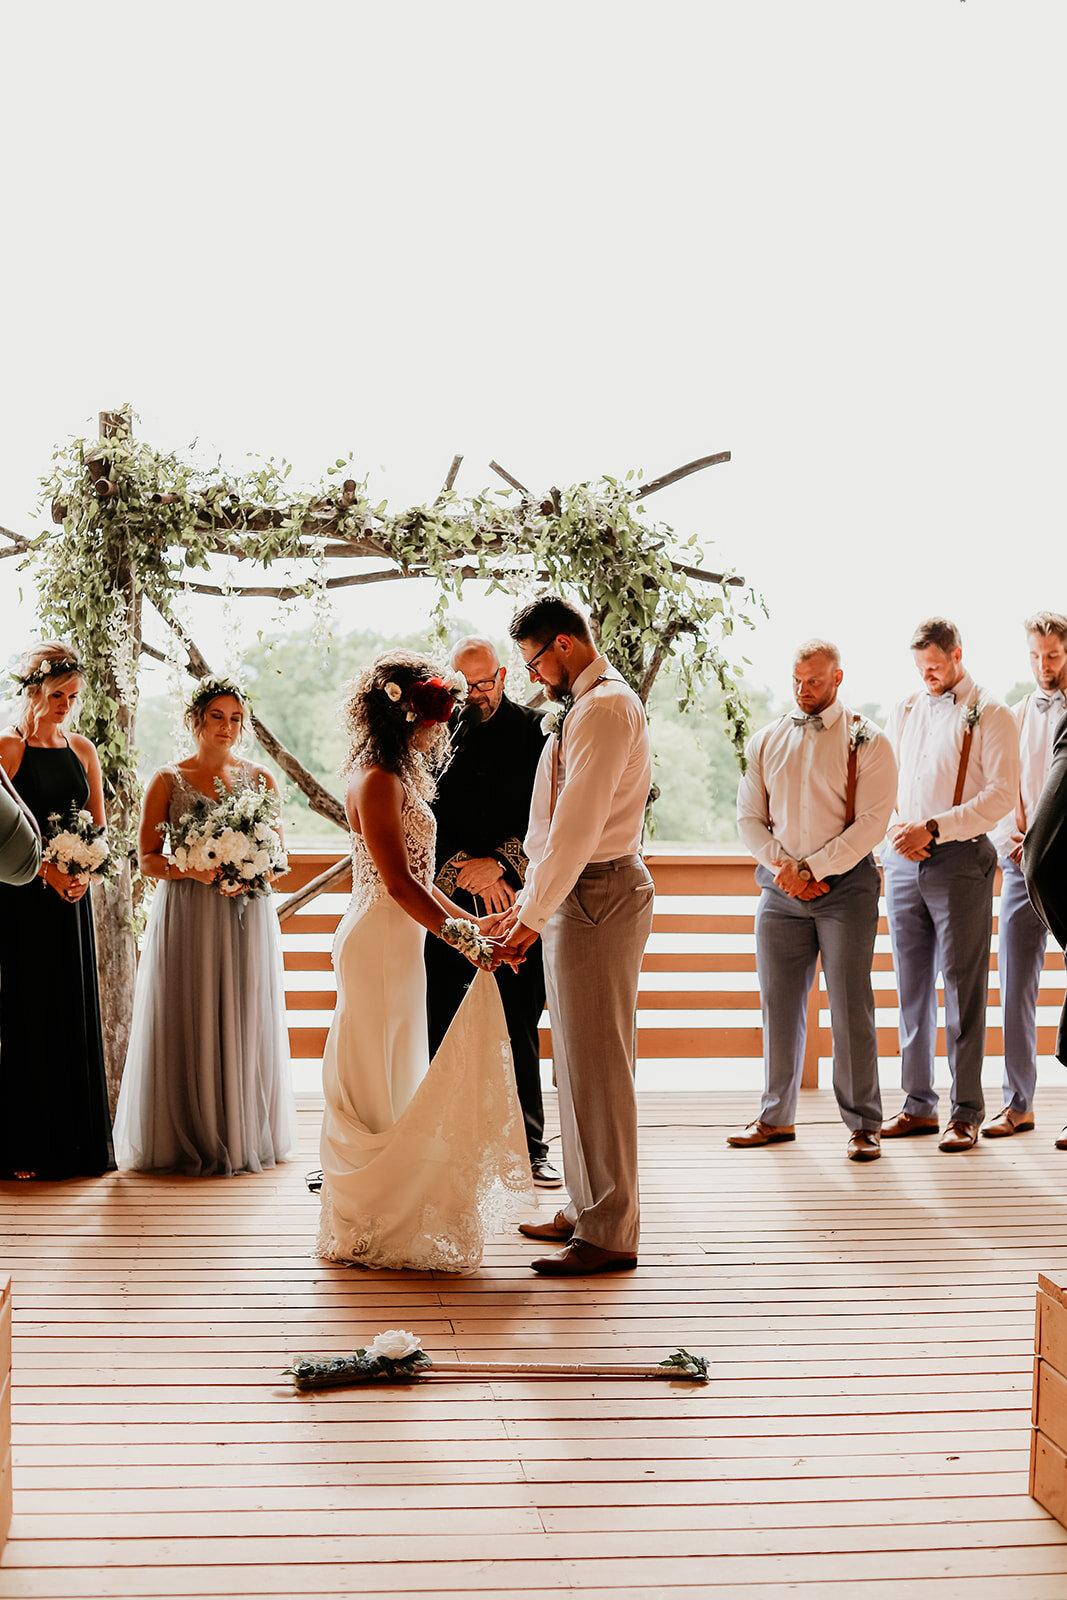 august-wolf-floral-design-des-moines-iowa-ames-wedding-florist-flowers-arch-boho-flower-crown-tattoo-jump-the-broom-suspenders-lace-dress-evergreen-bridesmaid.jpg